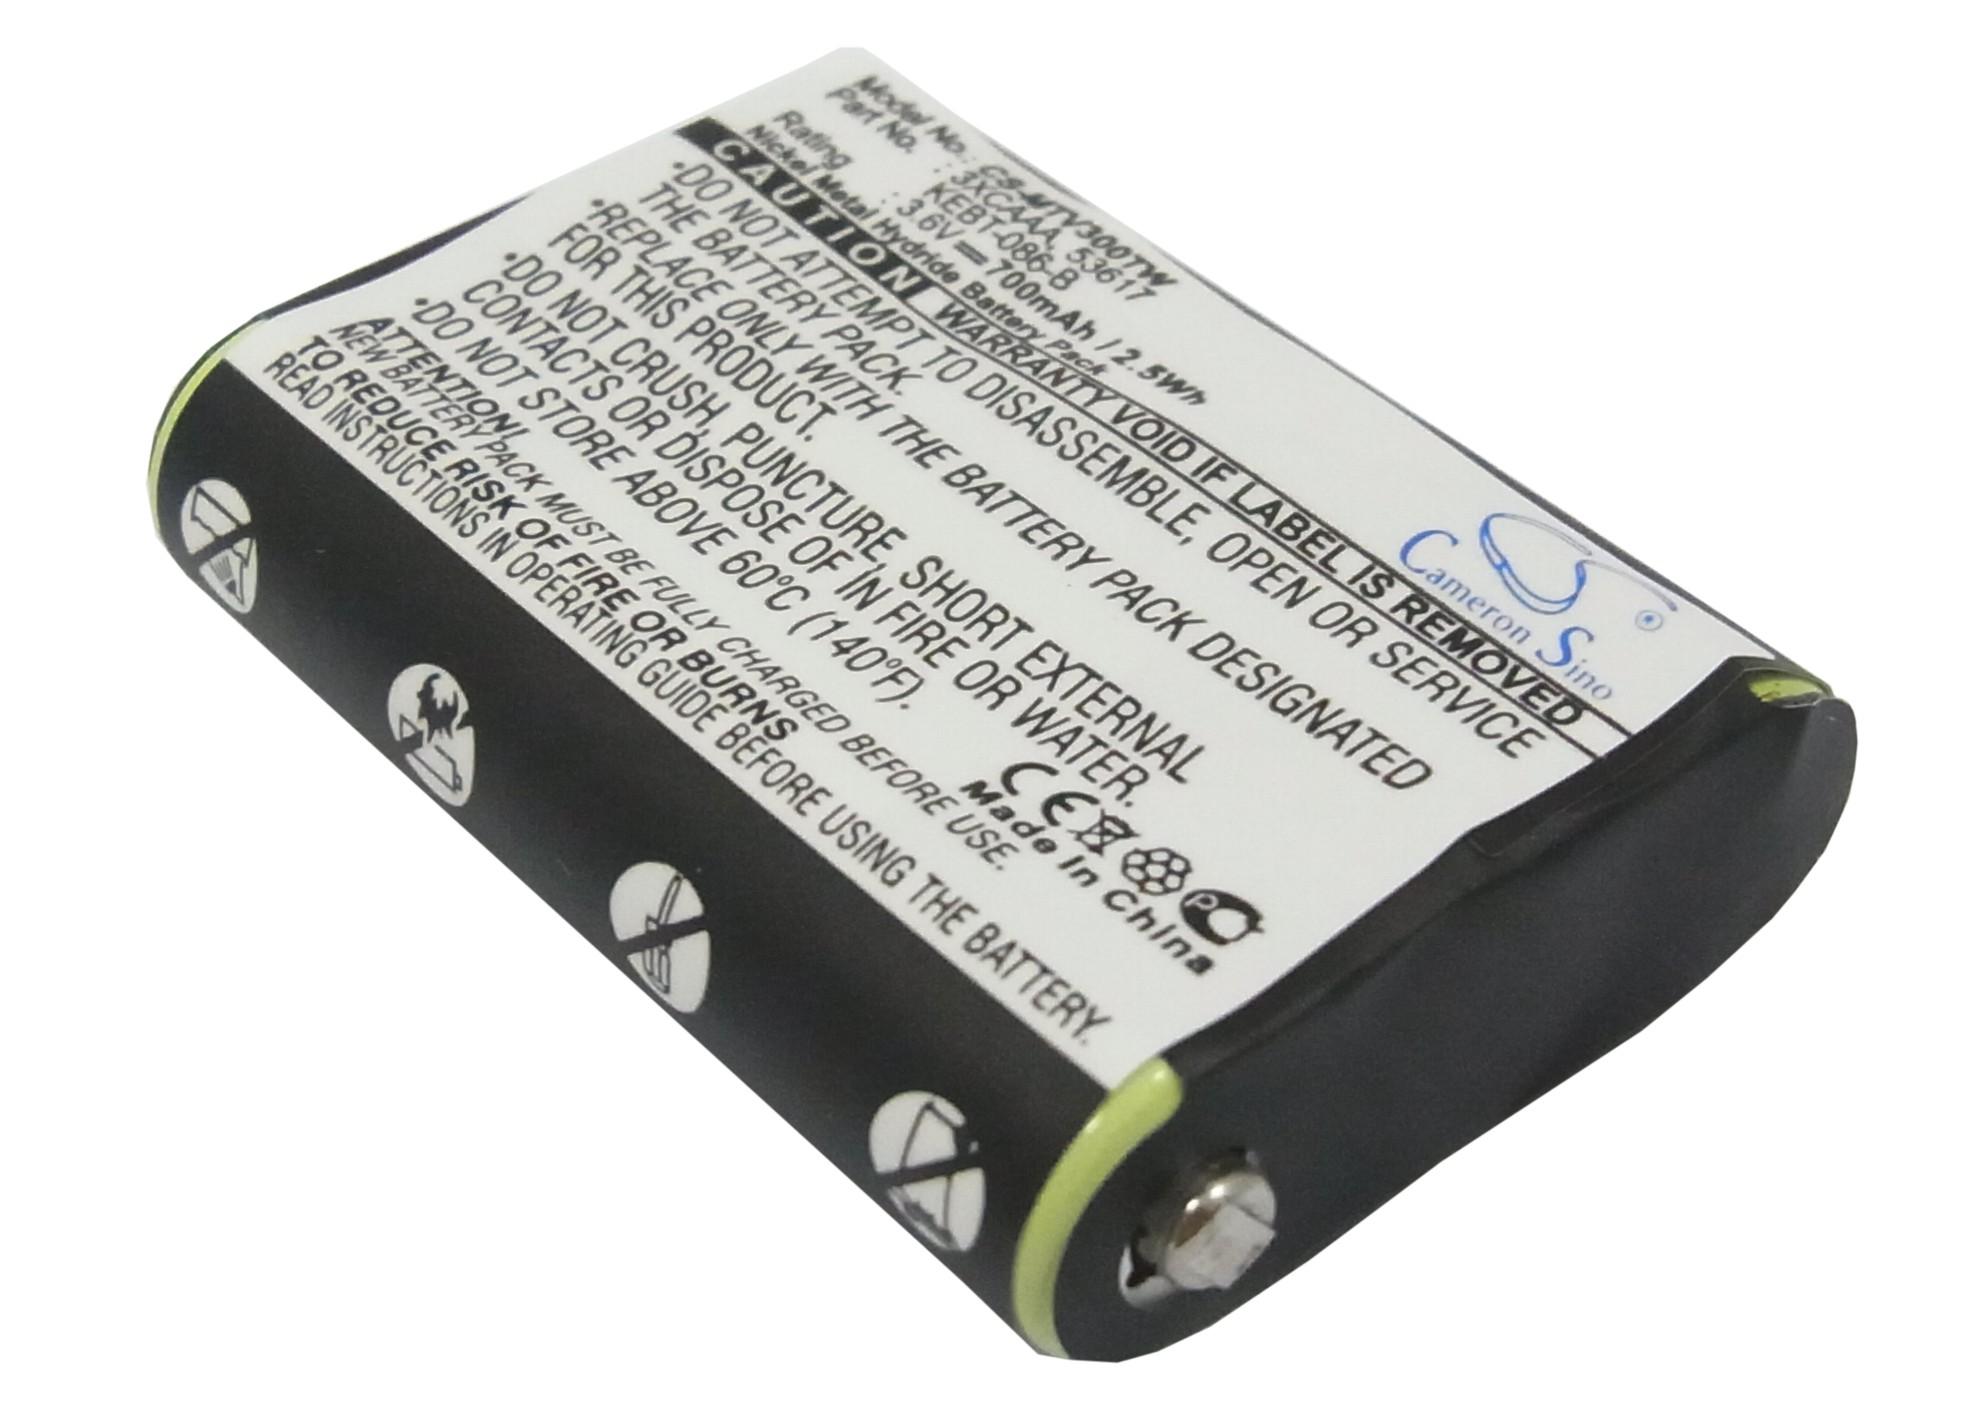 Cameron Sino baterie do vysílaček pro MOTOROLA SX500R 3.6V Ni-MH 700mAh černá - neoriginální